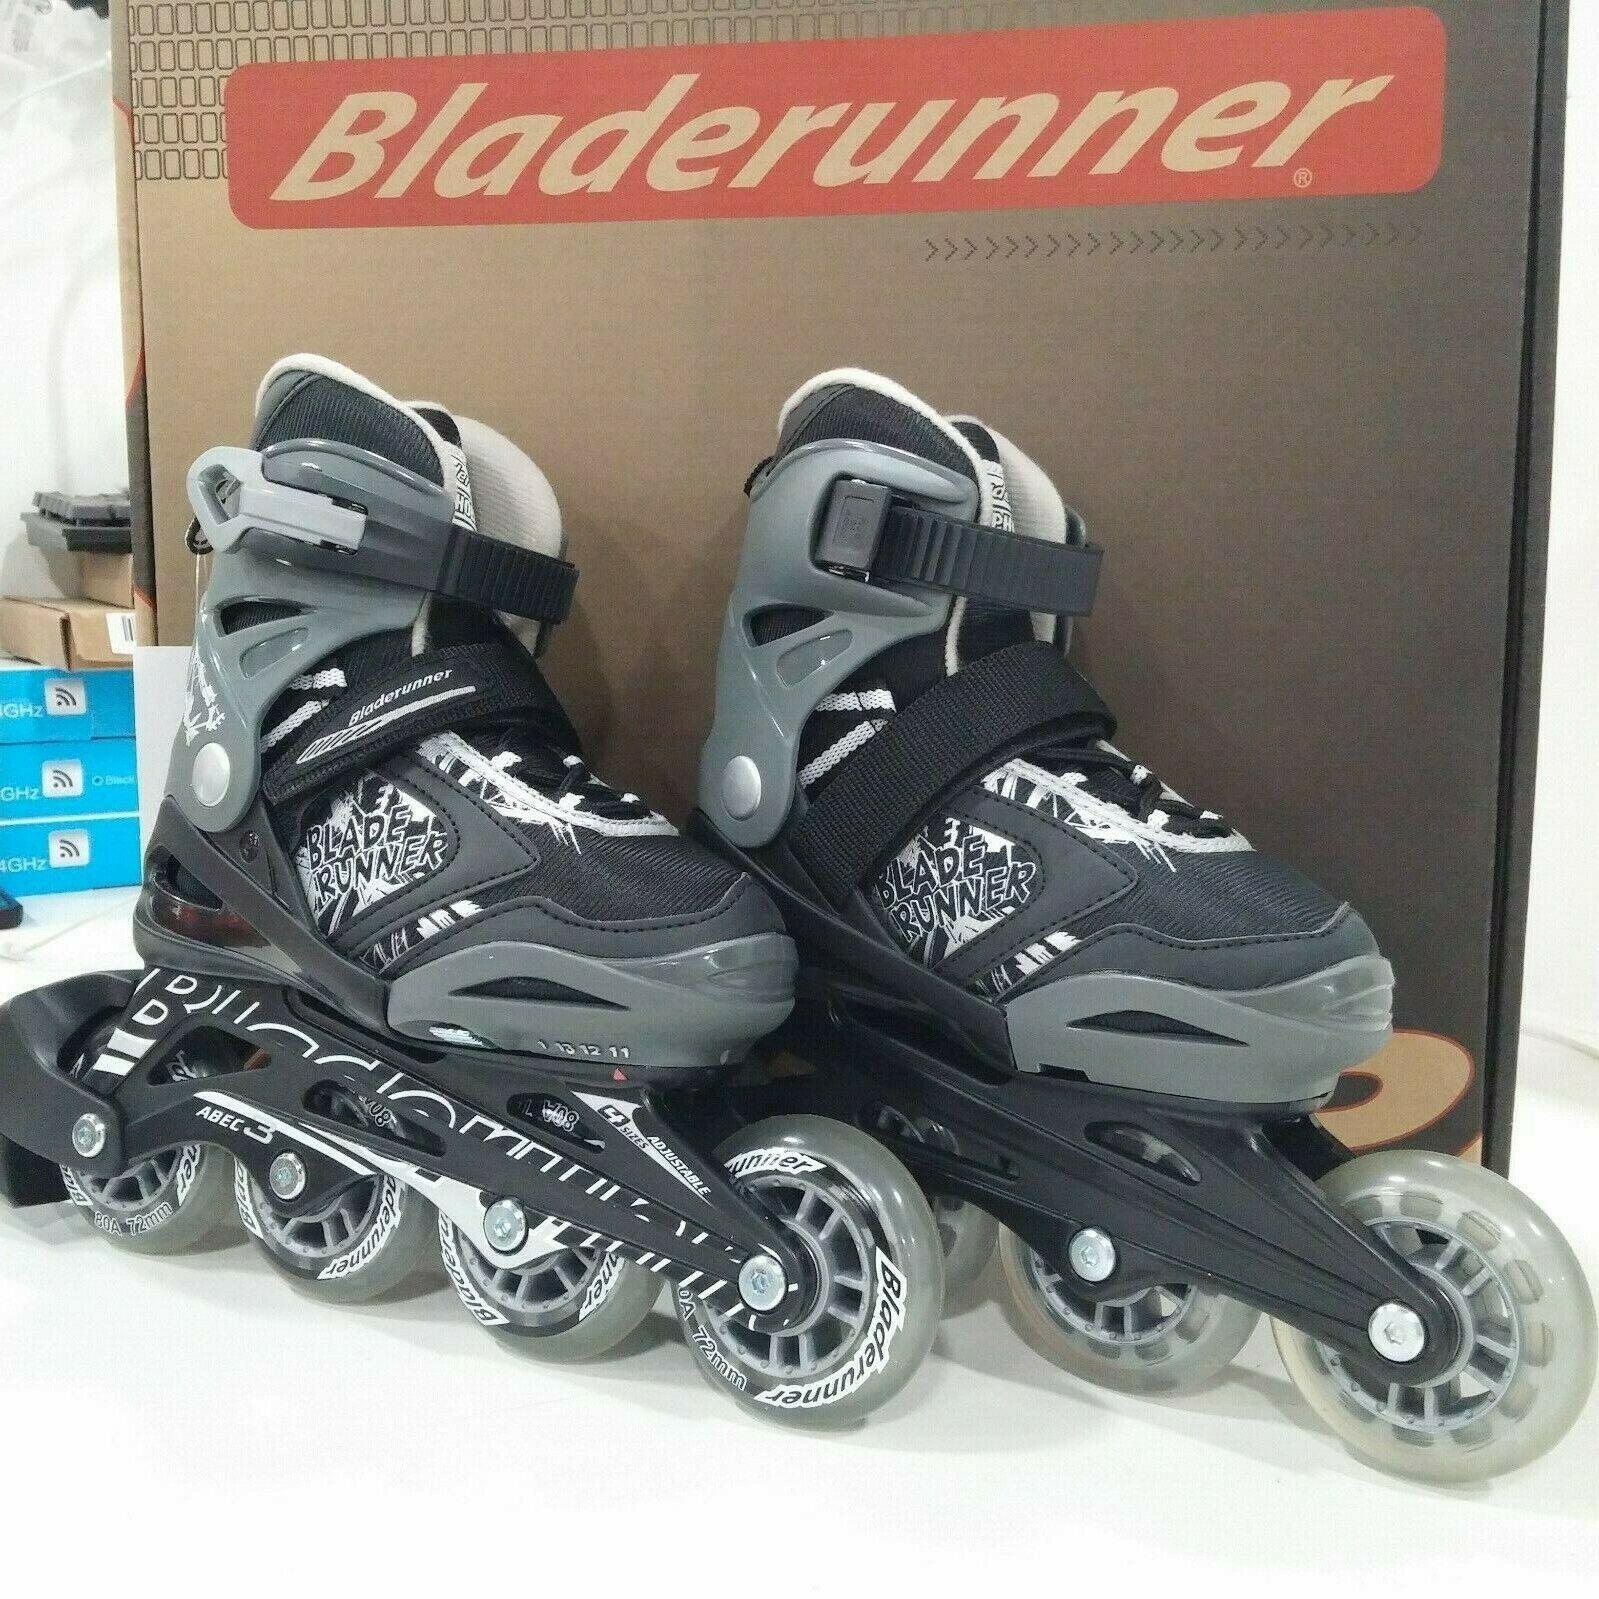 Bladerunner Phoenix S s Rollerblades, adjustable, Junior 1    small kids 1  take up to 70% off